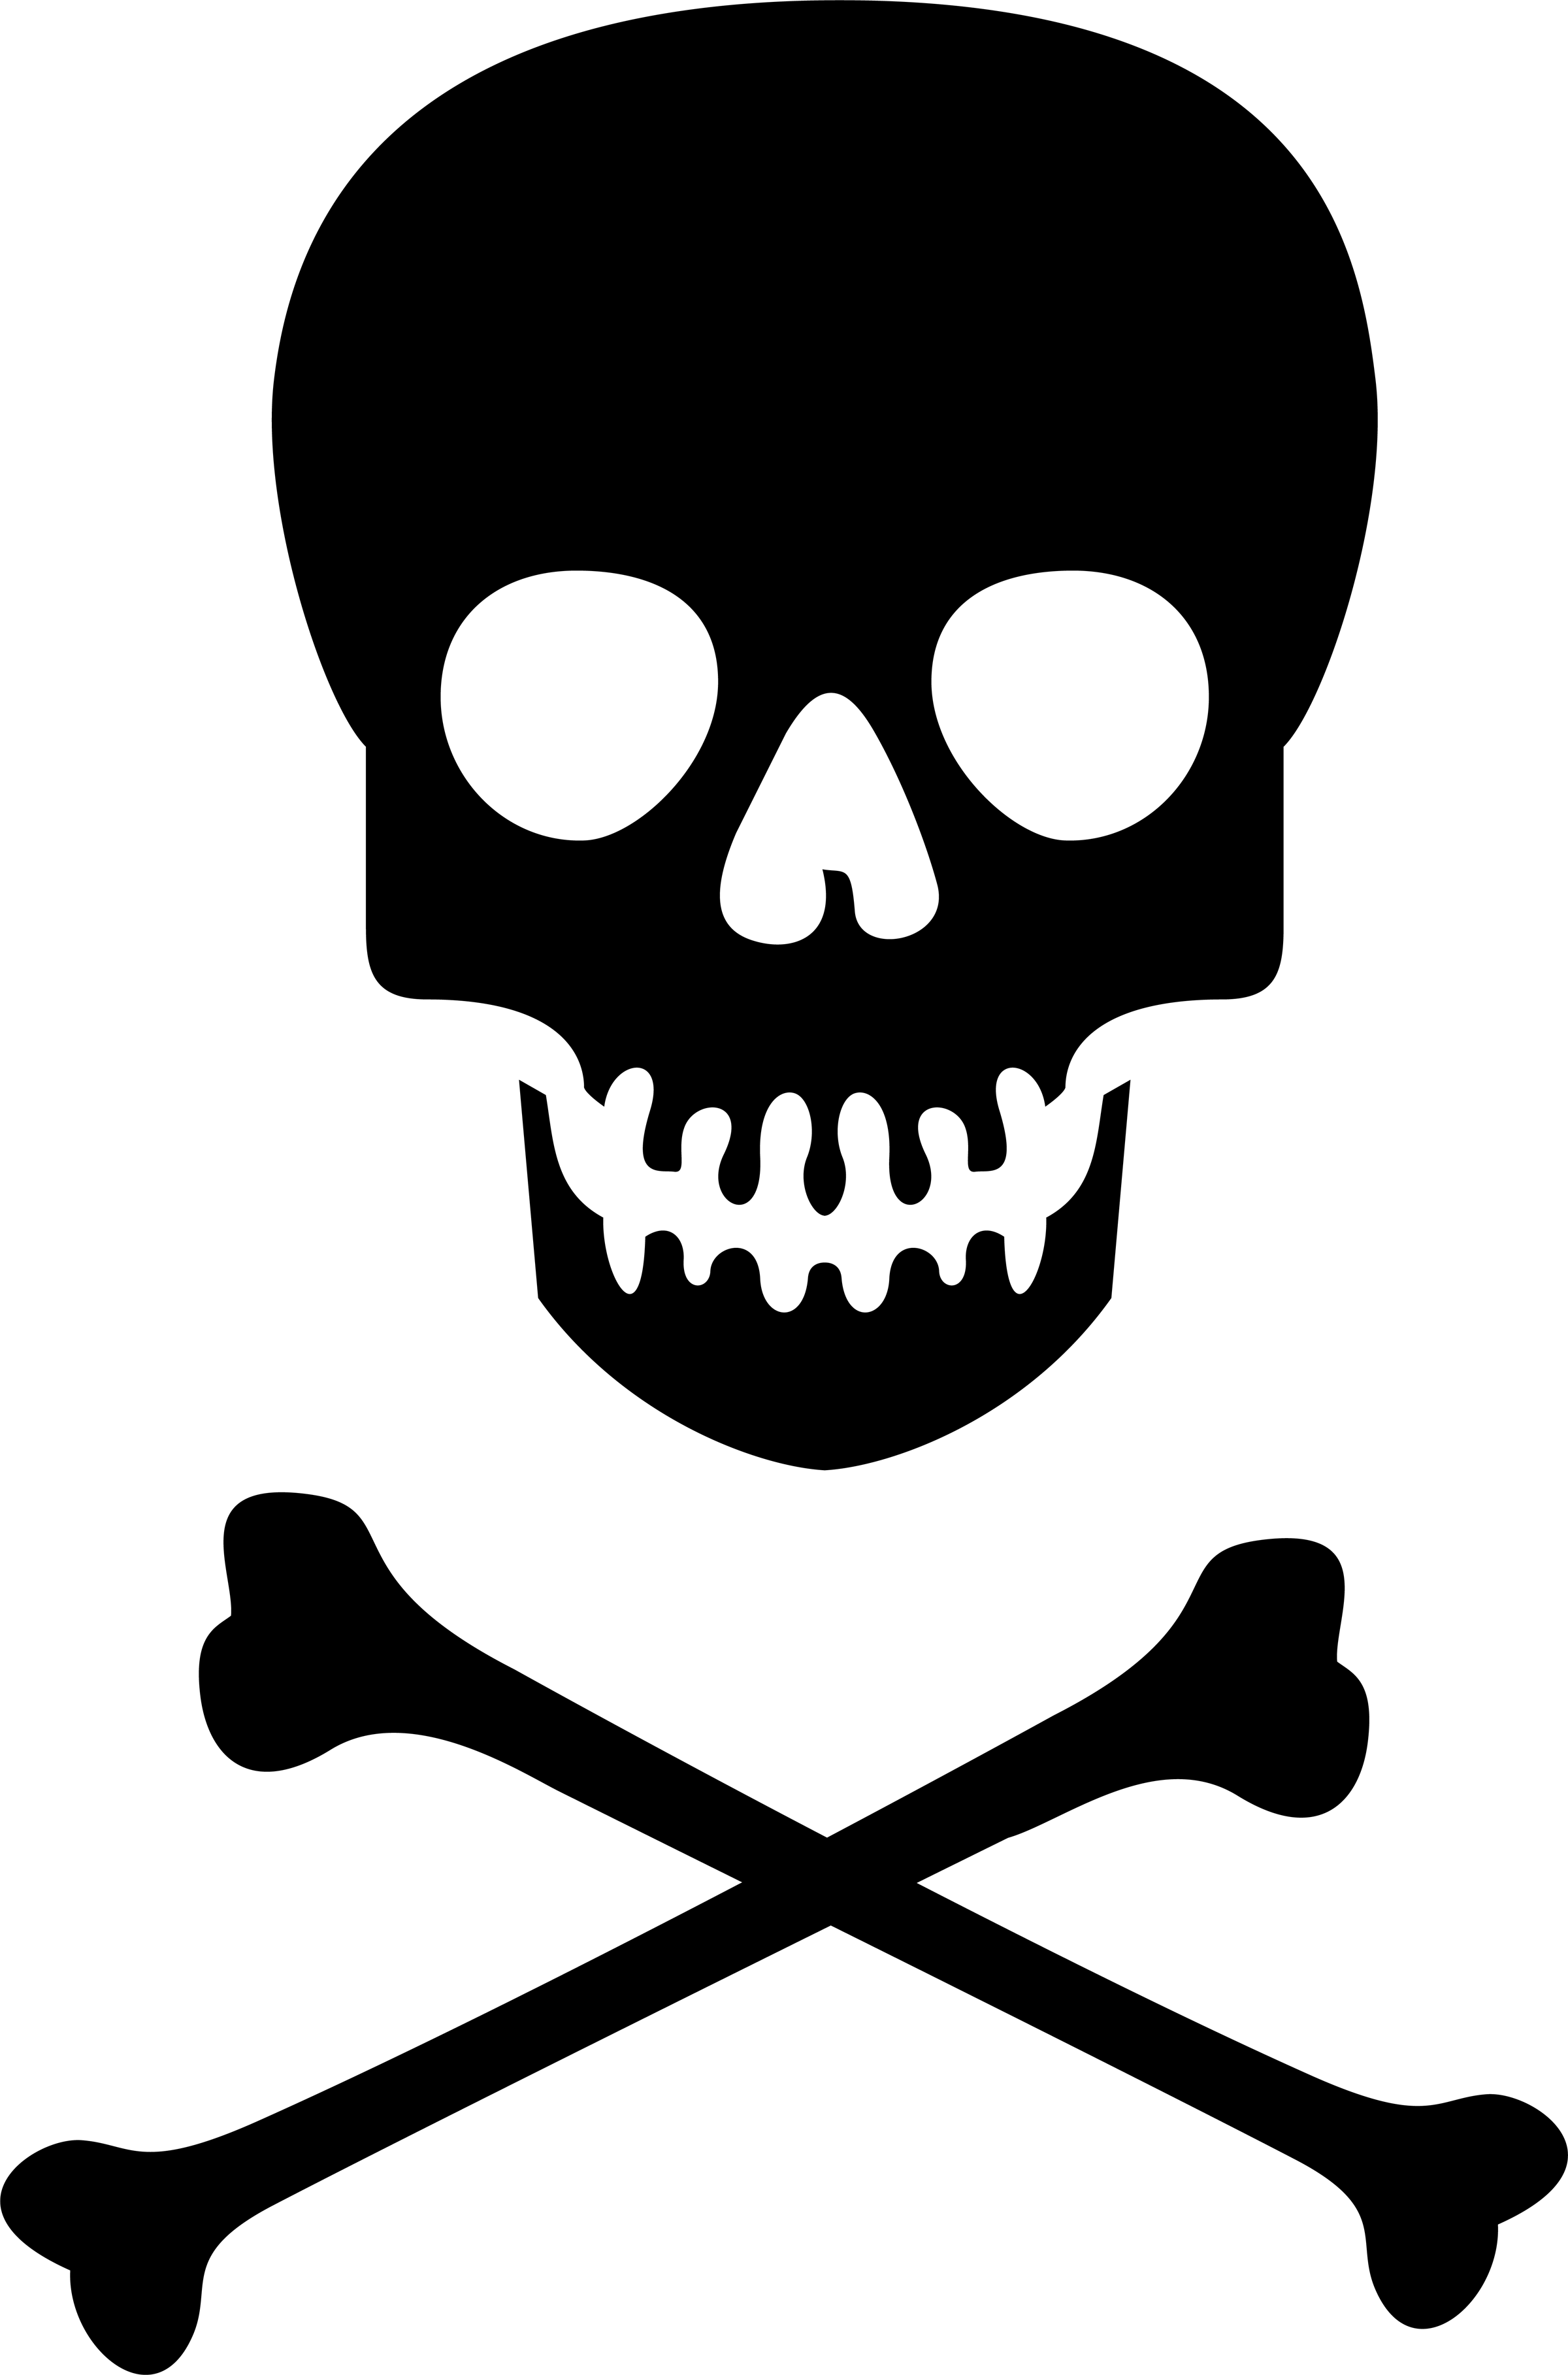 Skull And Crossbones Clipart Best-Skull And Crossbones Clipart Best-9